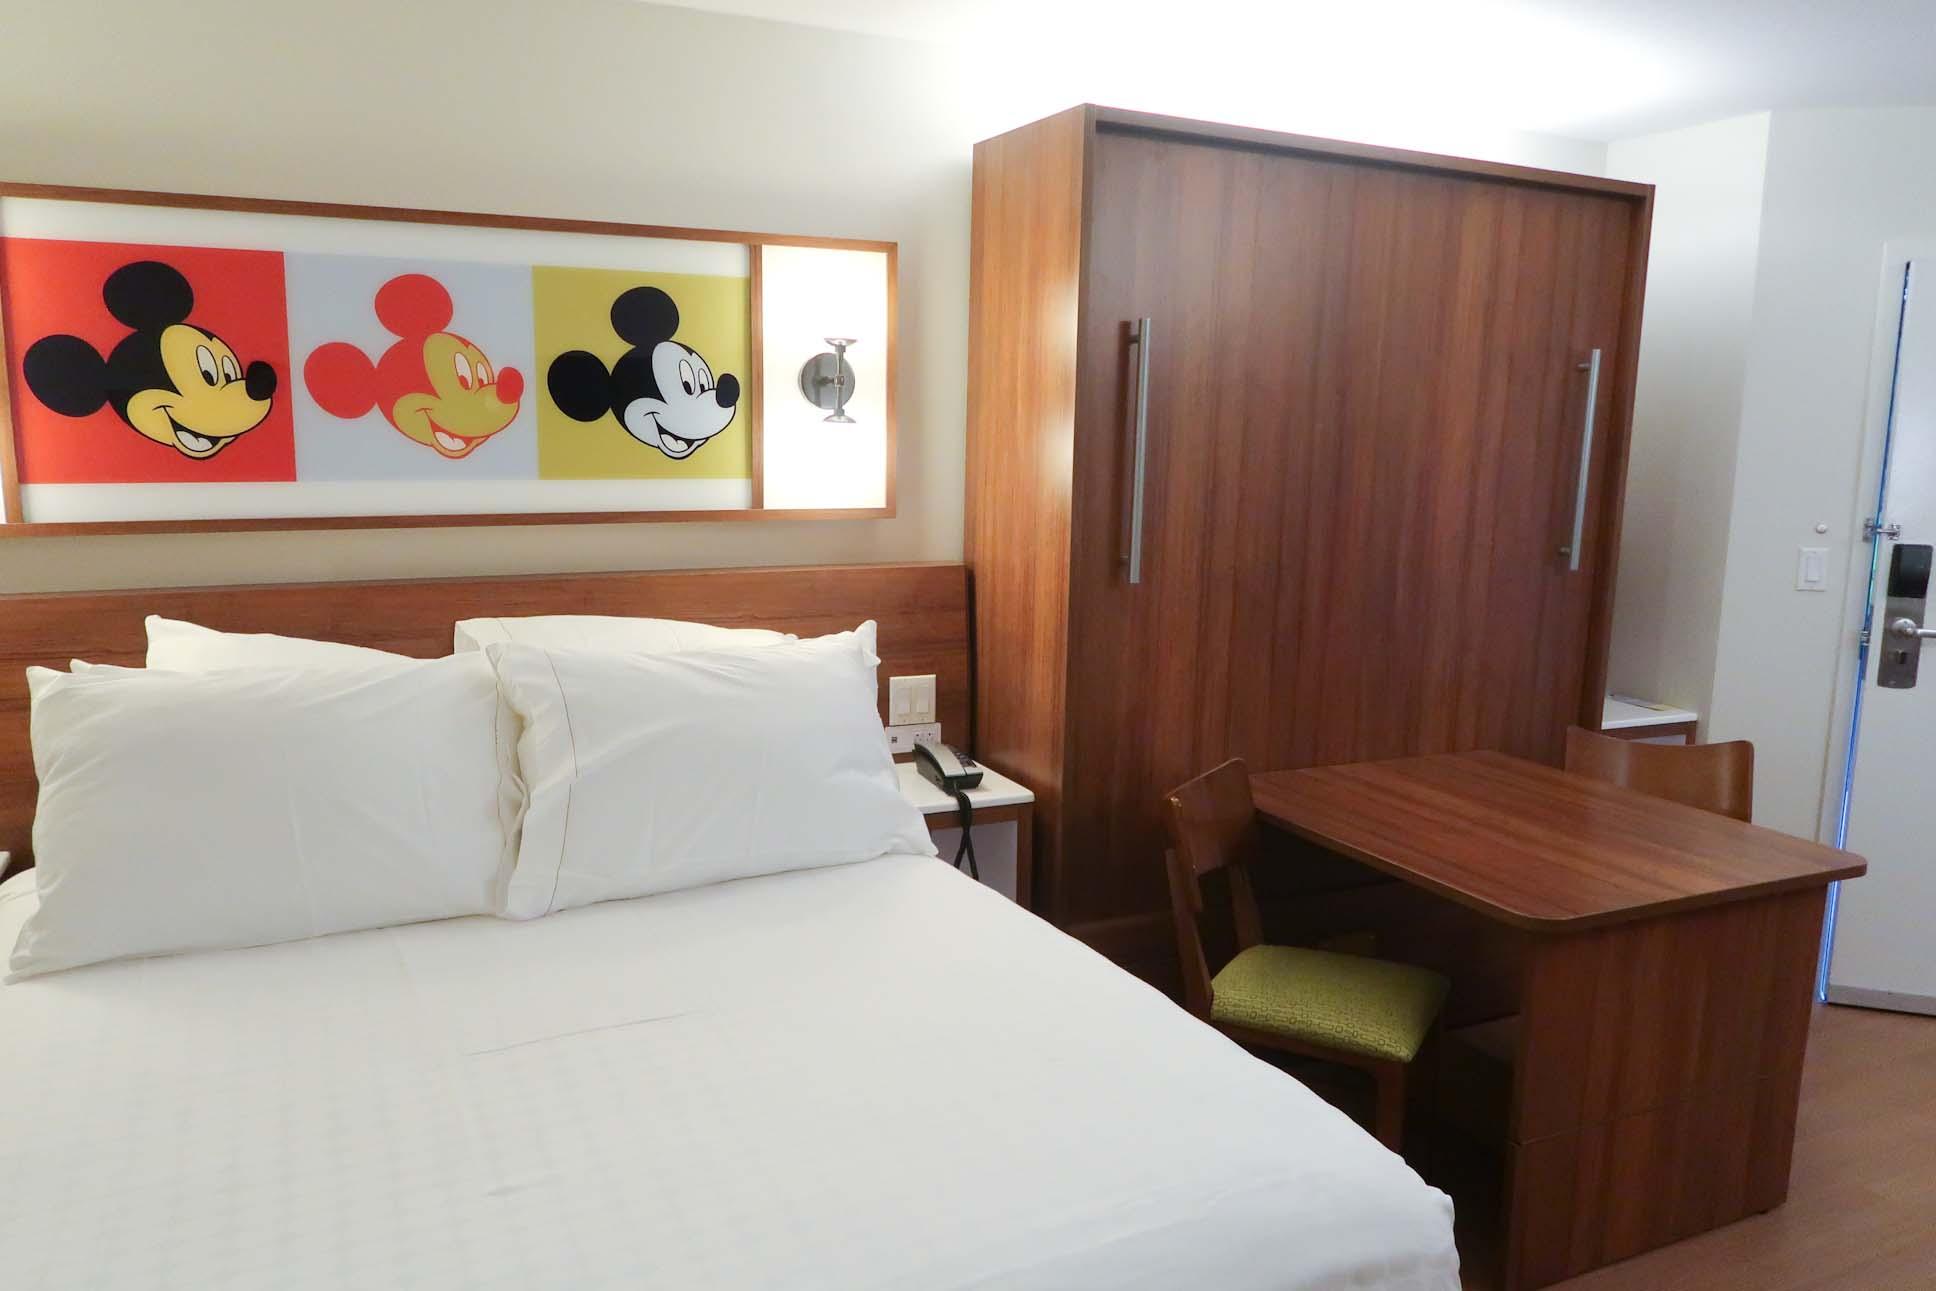 Disneys pop century refurbished rooms pop with practical style disneys pop century resort refurbished room publicscrutiny Images